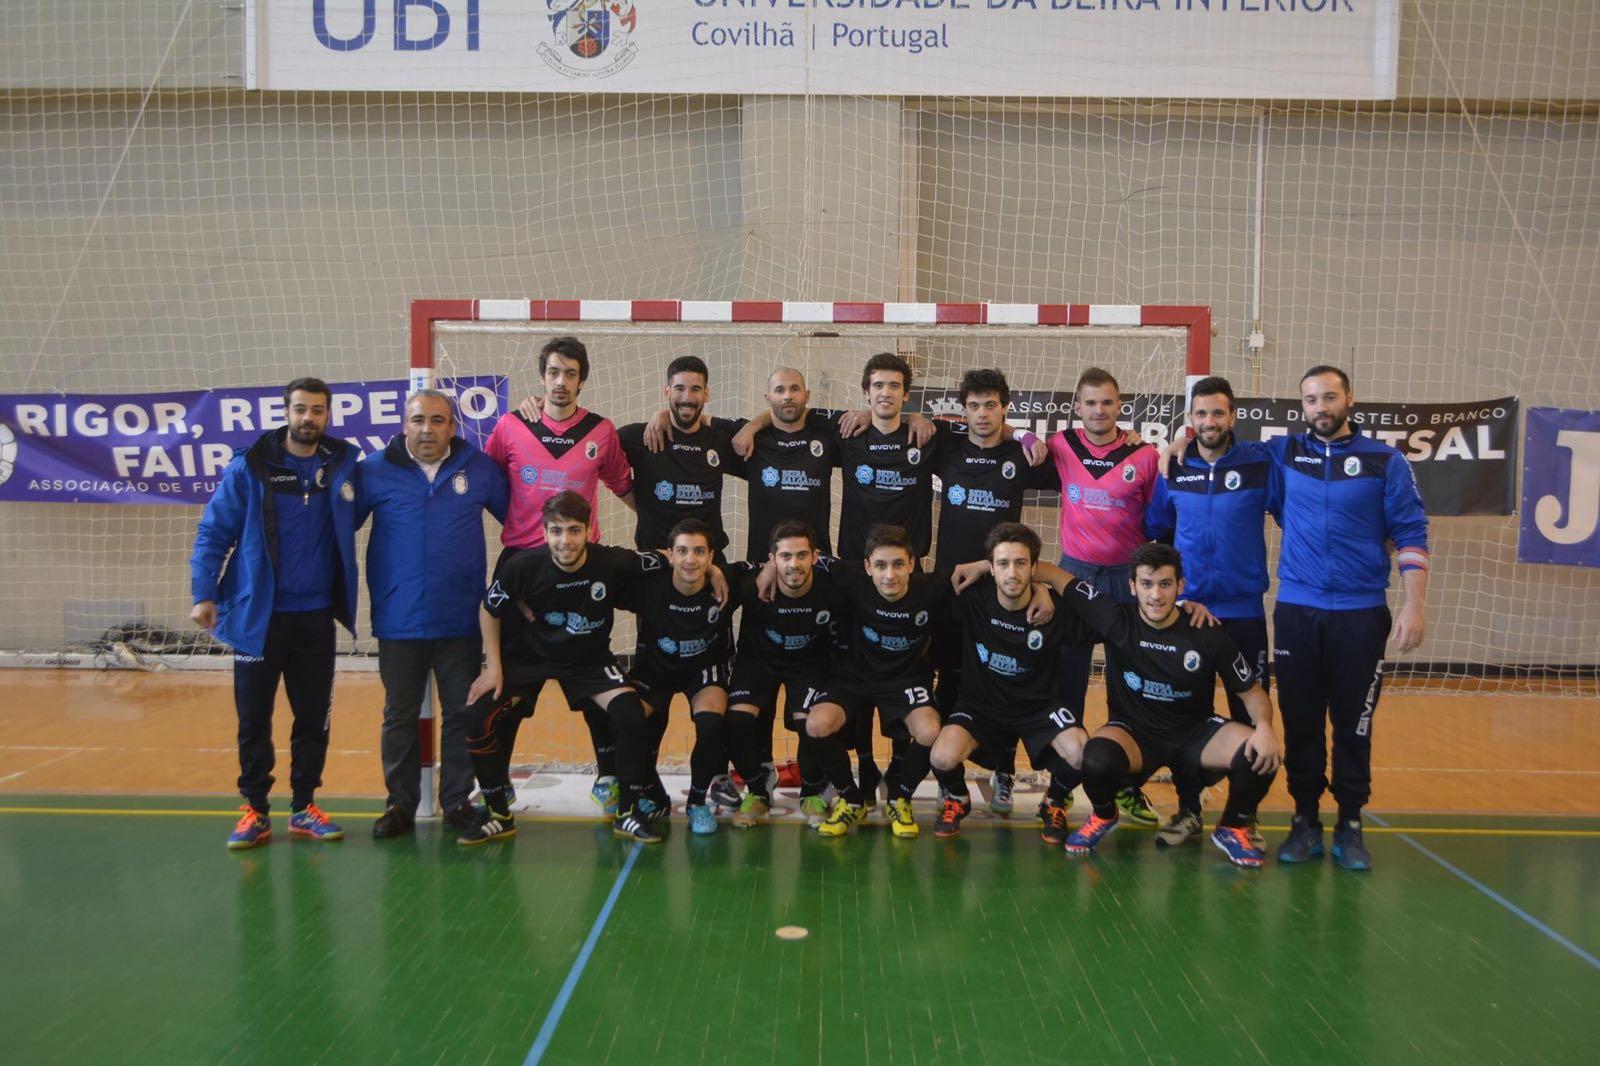 Campeões Distritais Séniores Futsal Masculino 2015 2016 d576843005acc